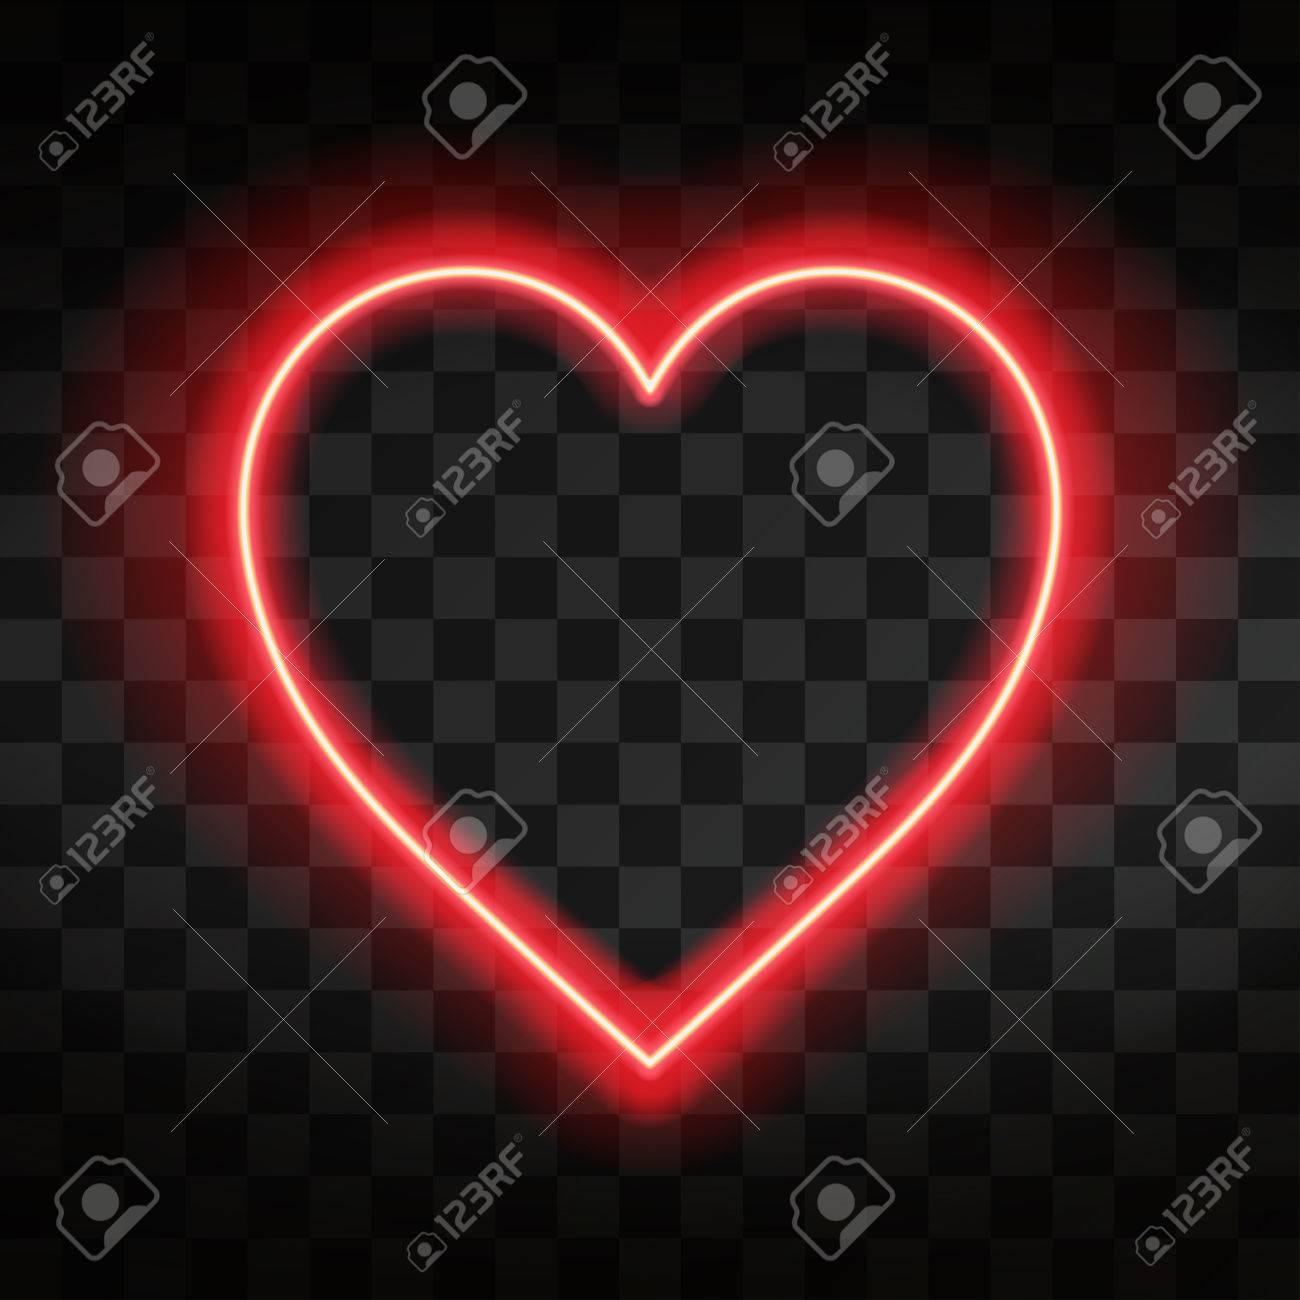 Bright neon heart. Heart sign on dark transparent background. Neon glow effect. Vector - 85859034